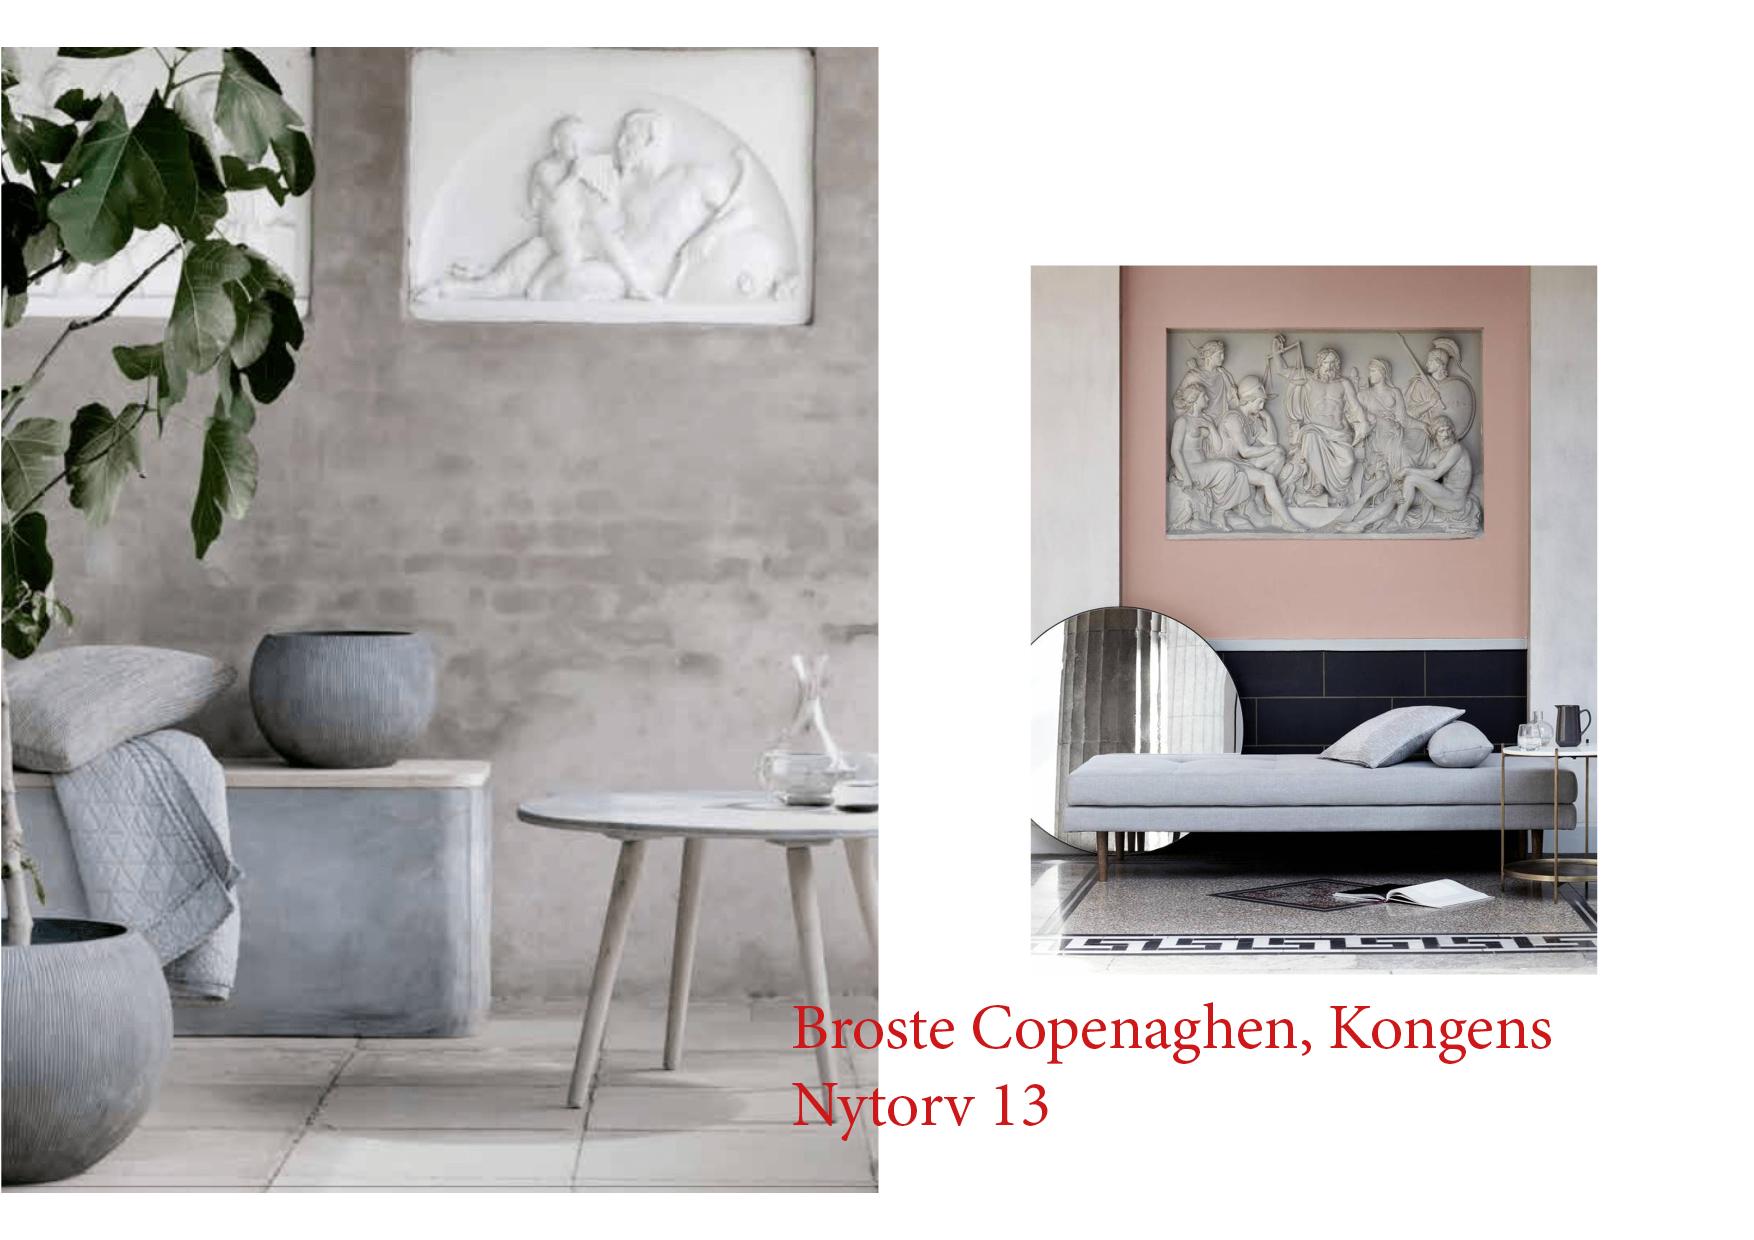 Copenaghen3